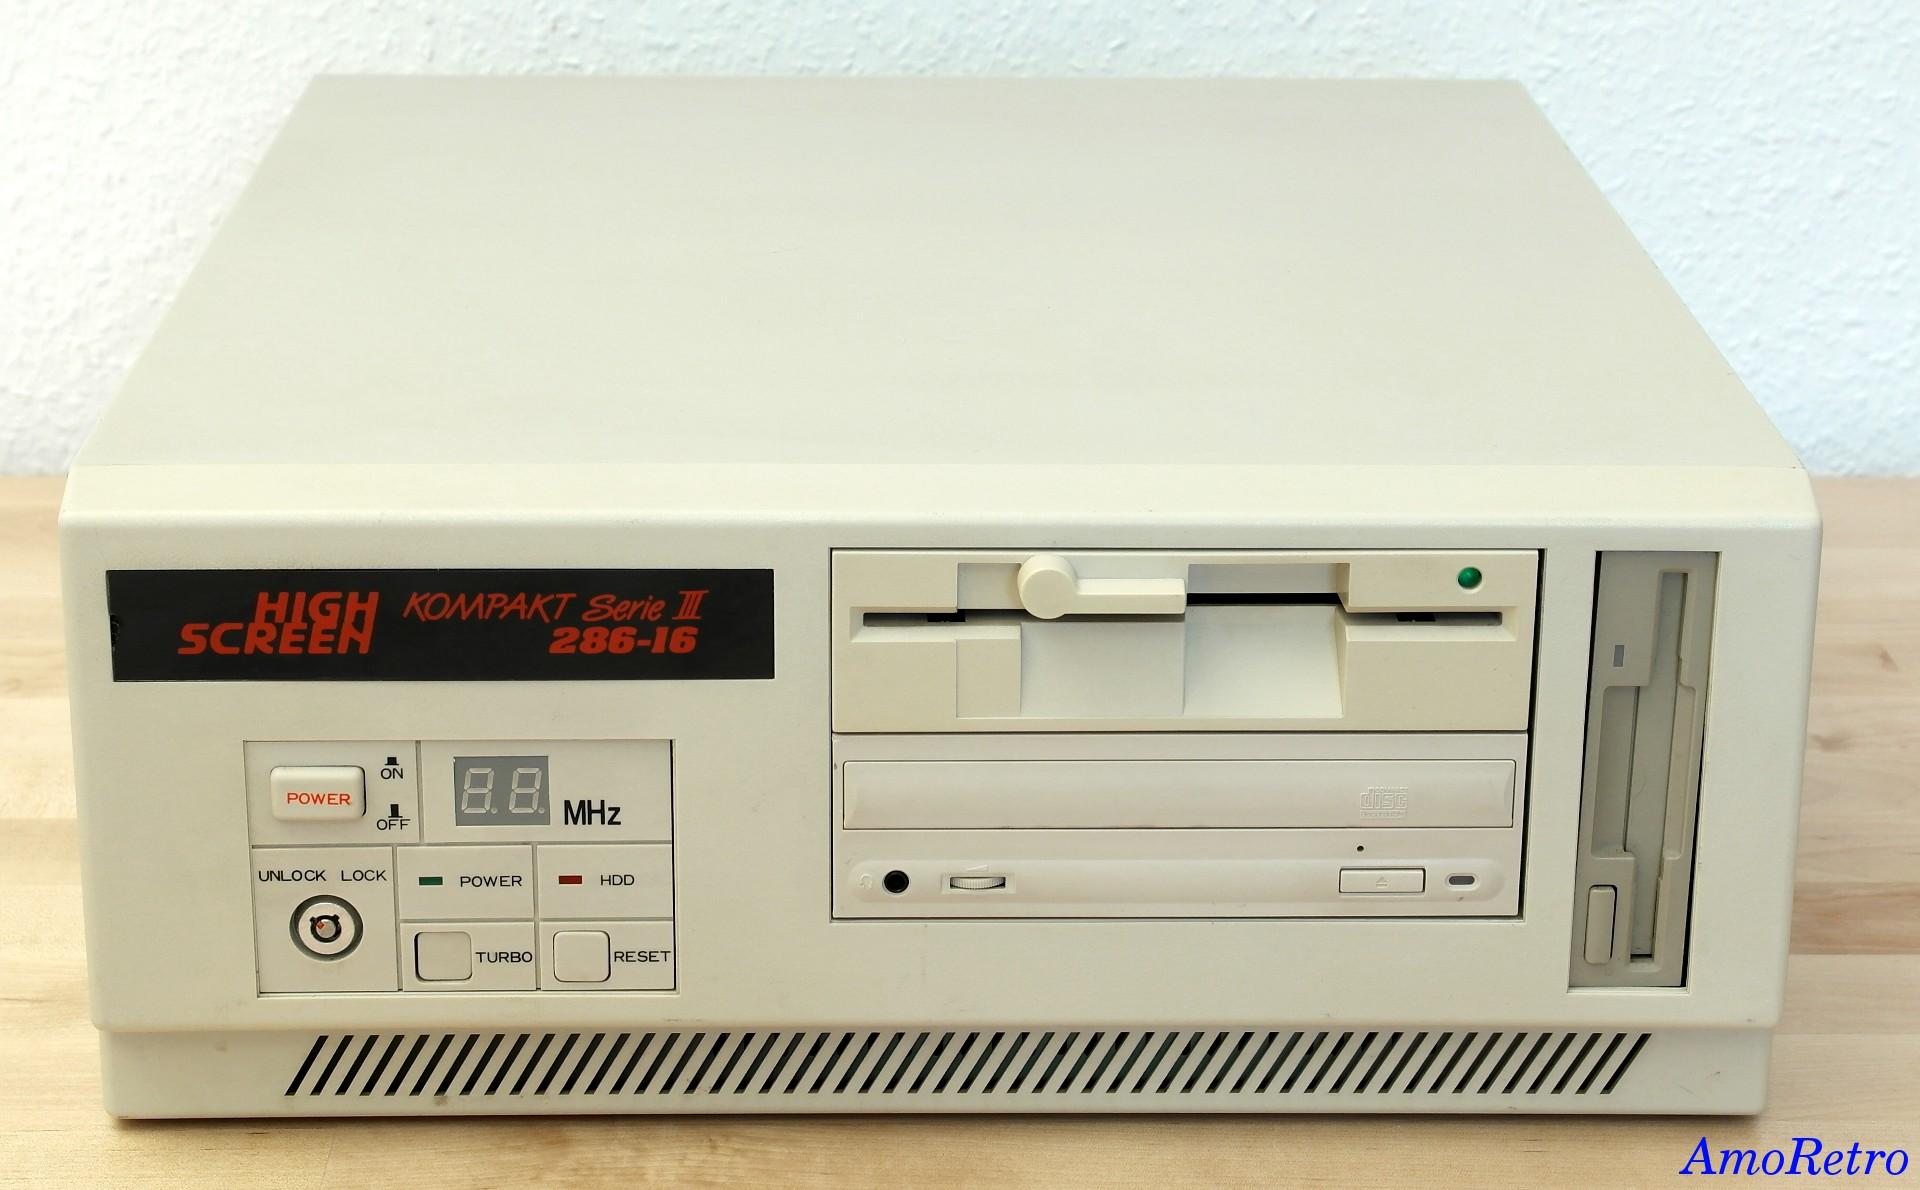 Highscreen 286-16MHz Kompakt III - Computer - 2x Floppy ...